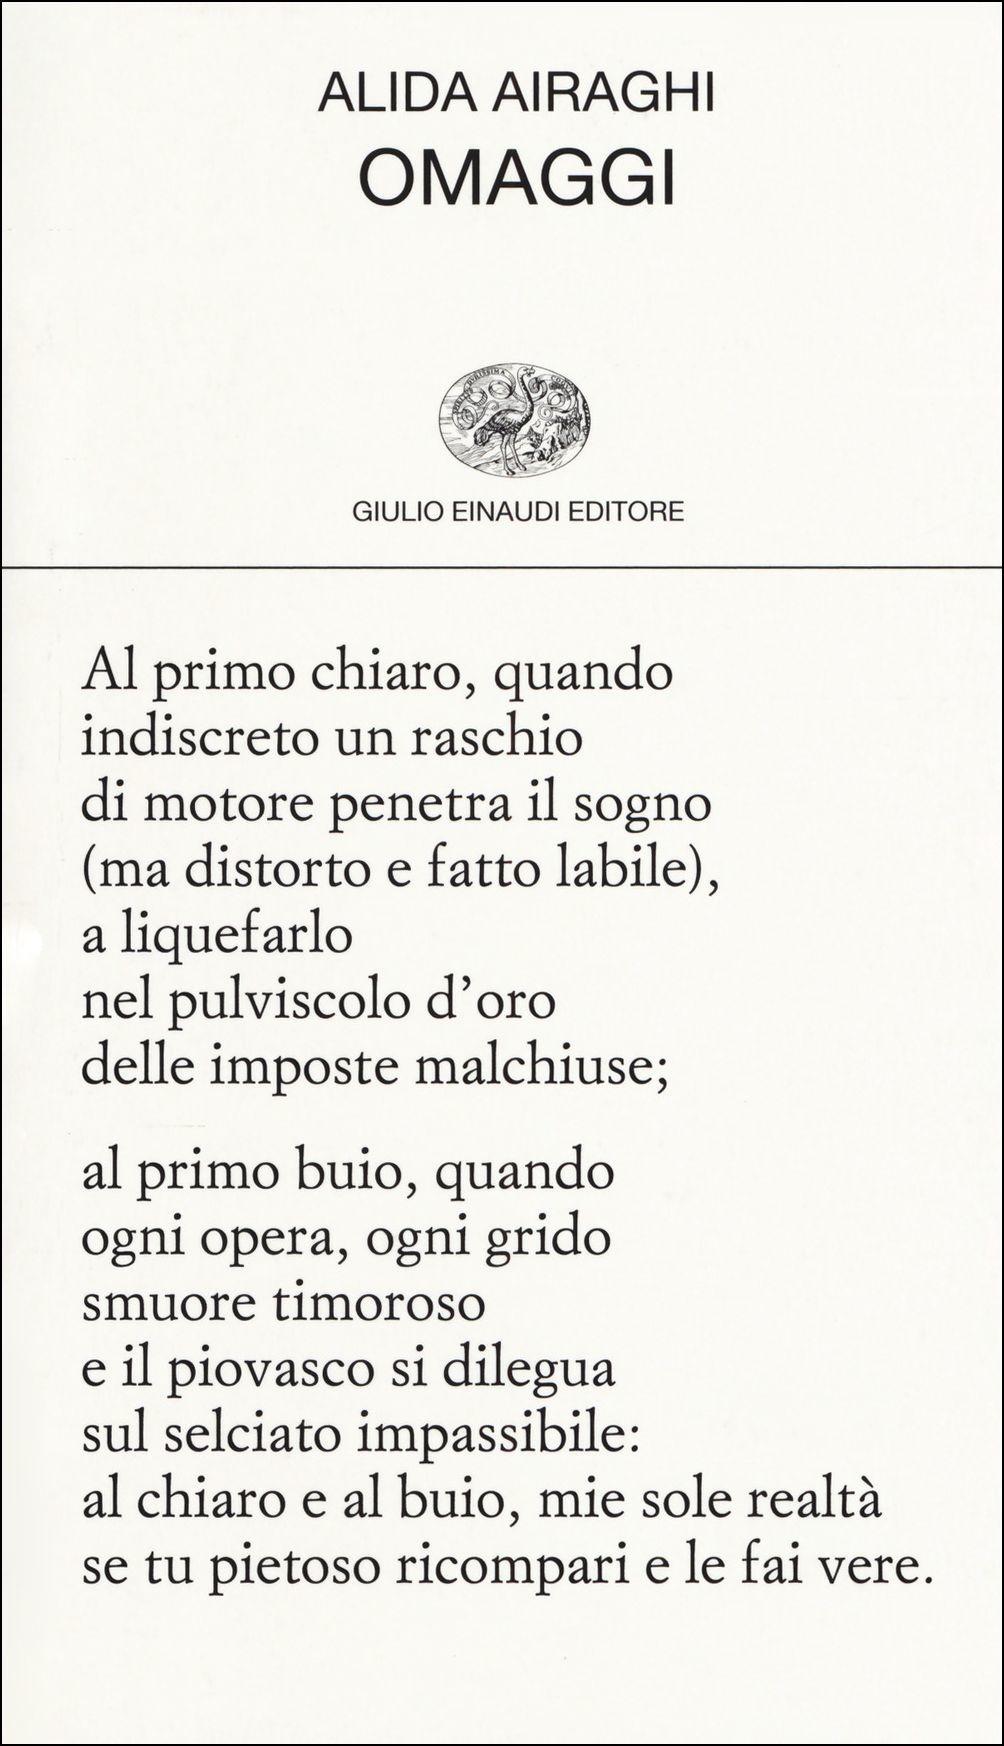 Omaggi - Alida Airaghi - Einaudi